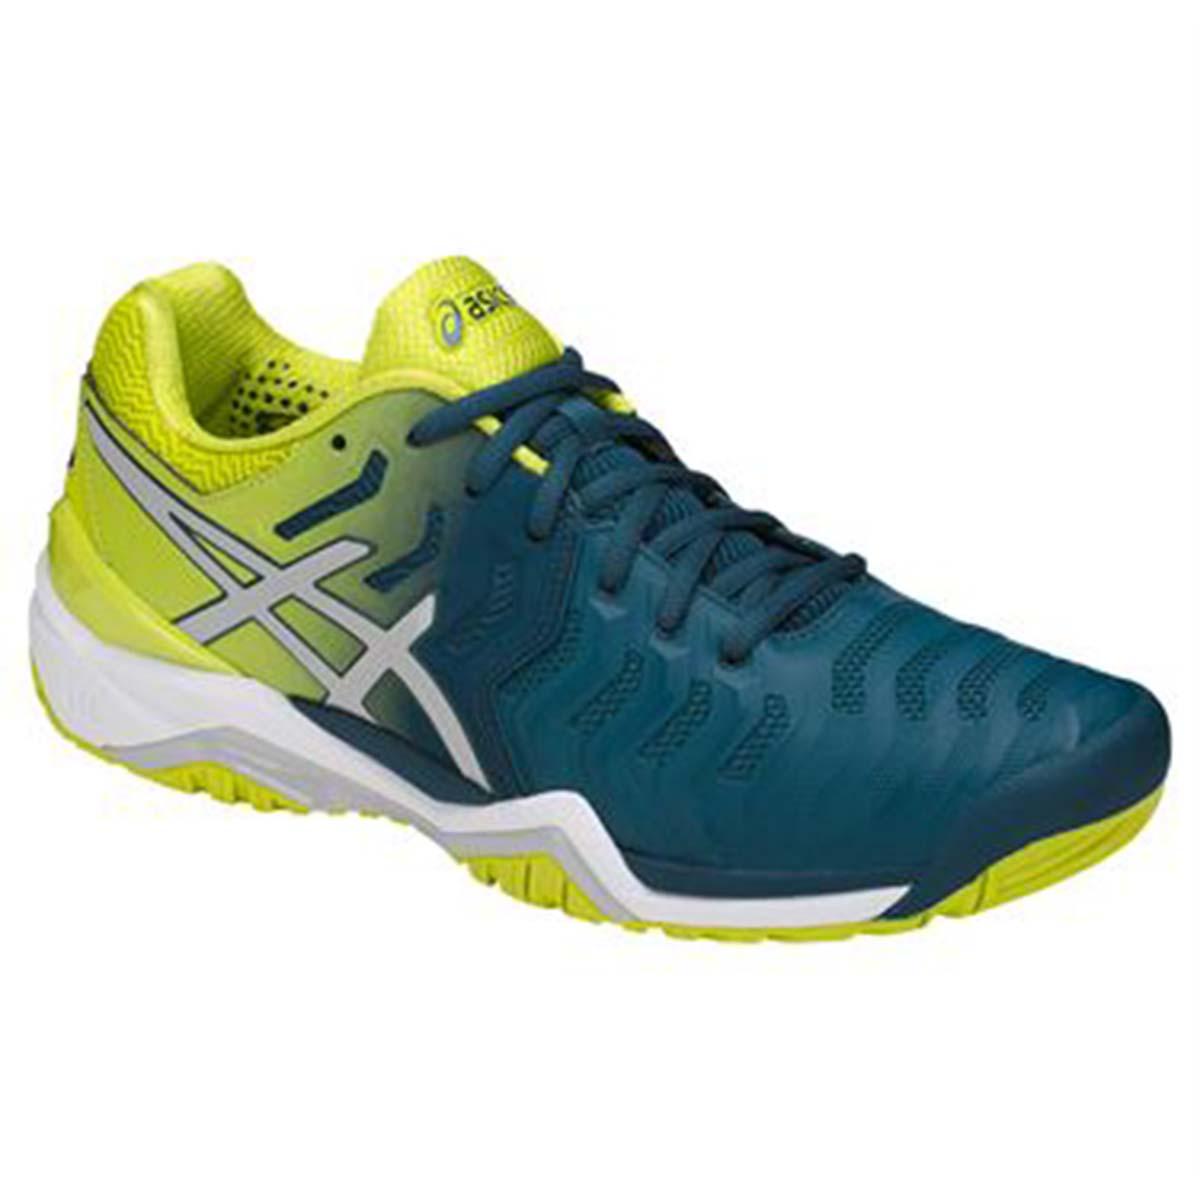 e422c75e6ab4 Buy Asics Gel Resolution 7 Tennis Shoes (Blue Sulphur White) Online